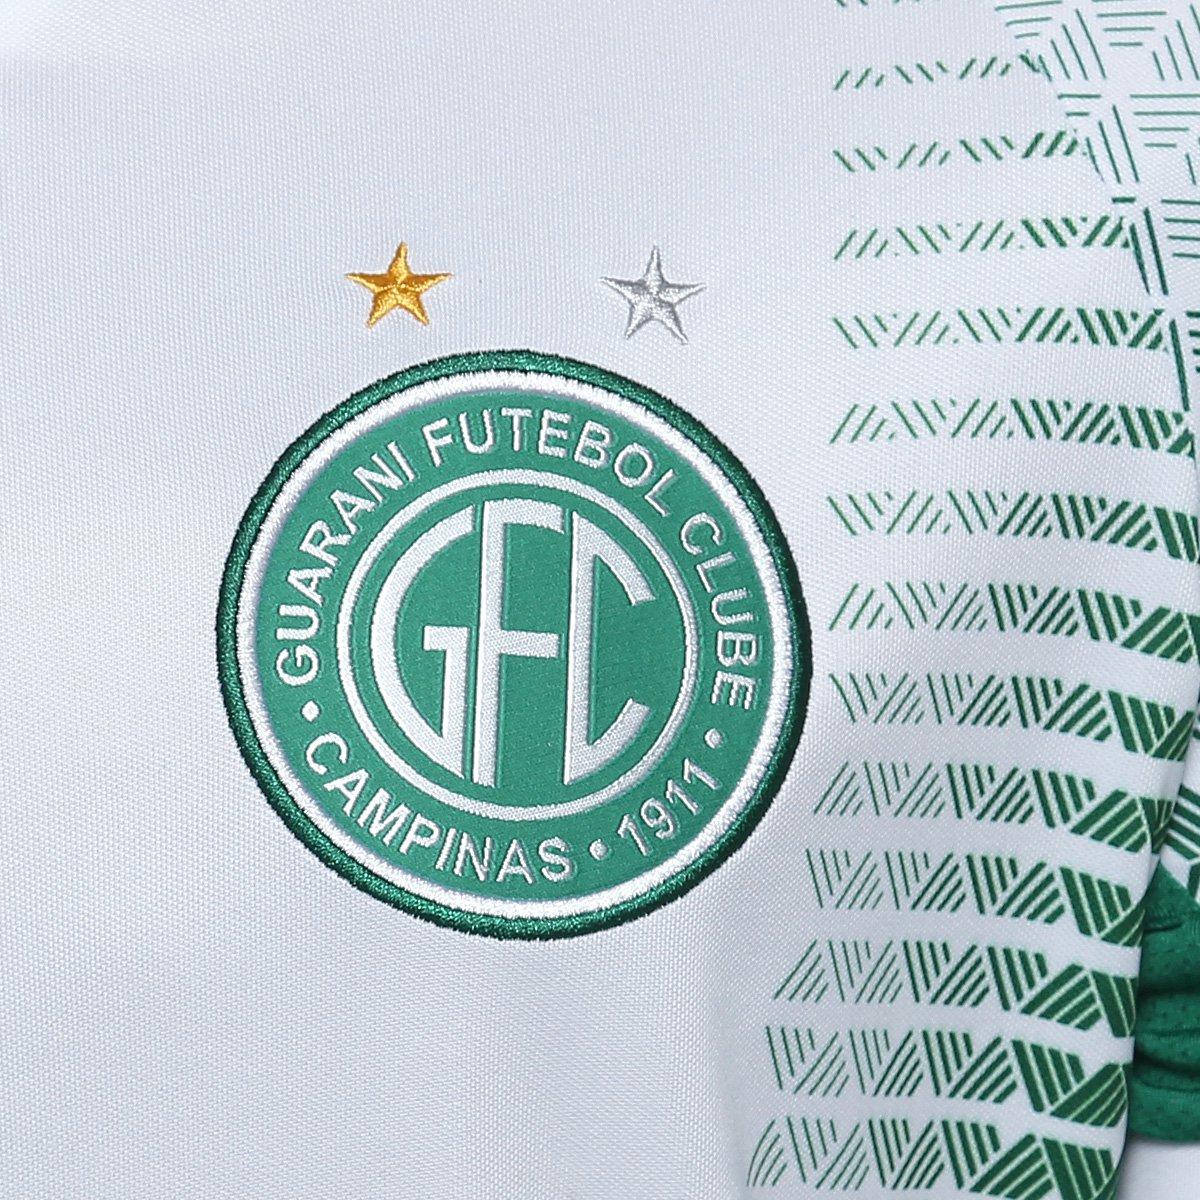 Camisa Guarani II 2018 s n° - Torcedor Topper Masculina - Compre ... ad56b6e9ec61f